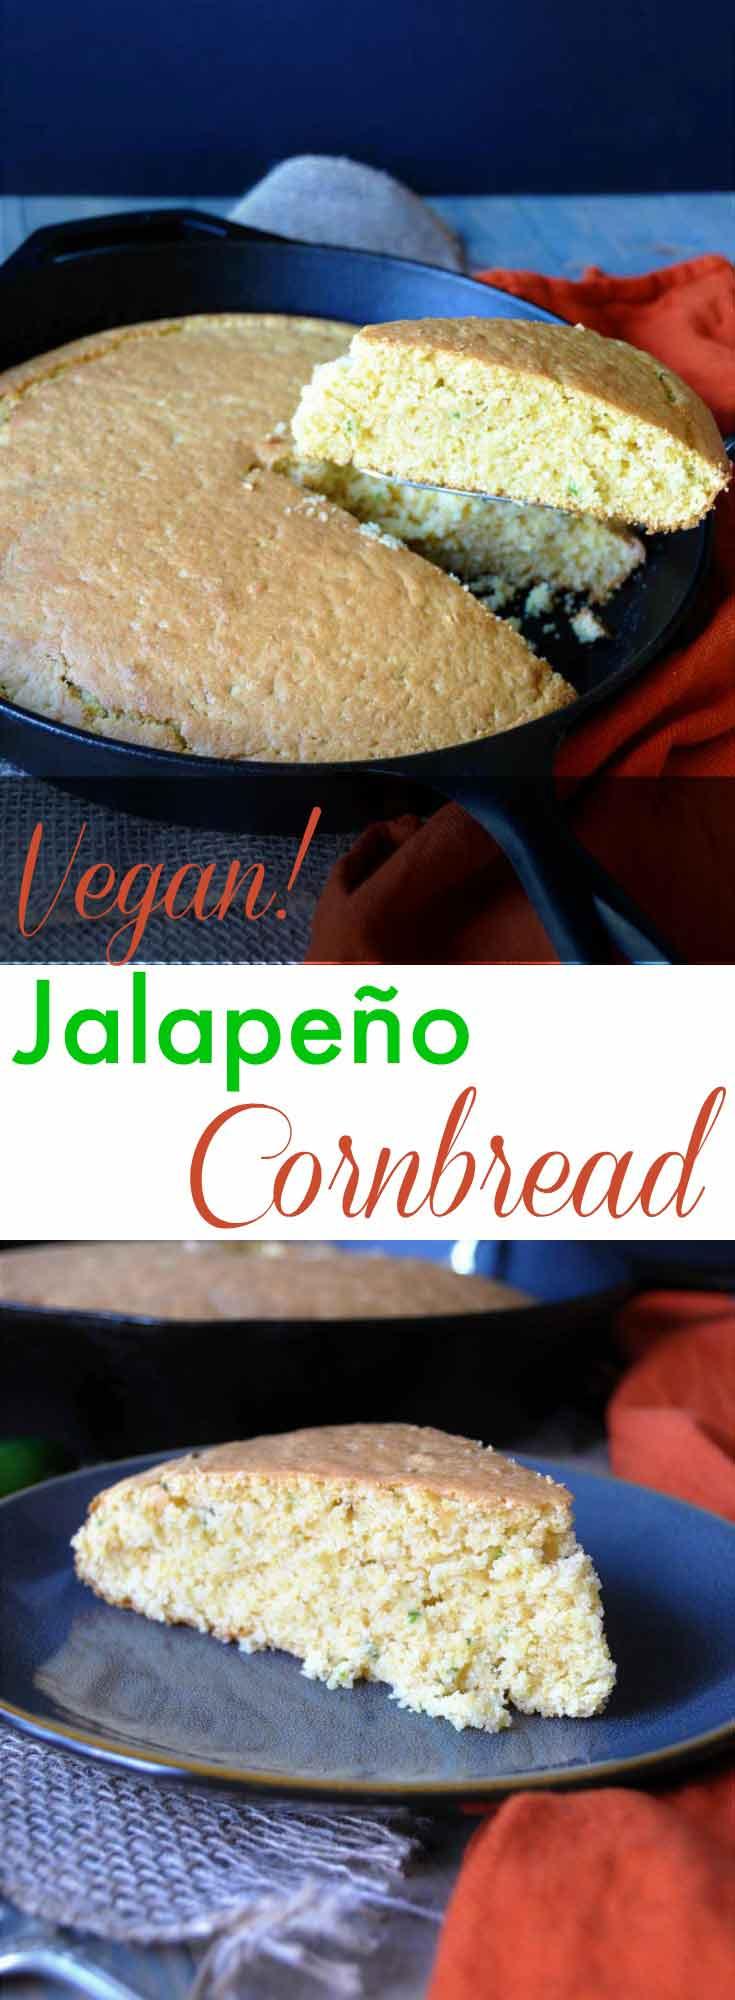 Spicy dairy-free, egg-free, and vegan jalapeño cornbread! So moist ...